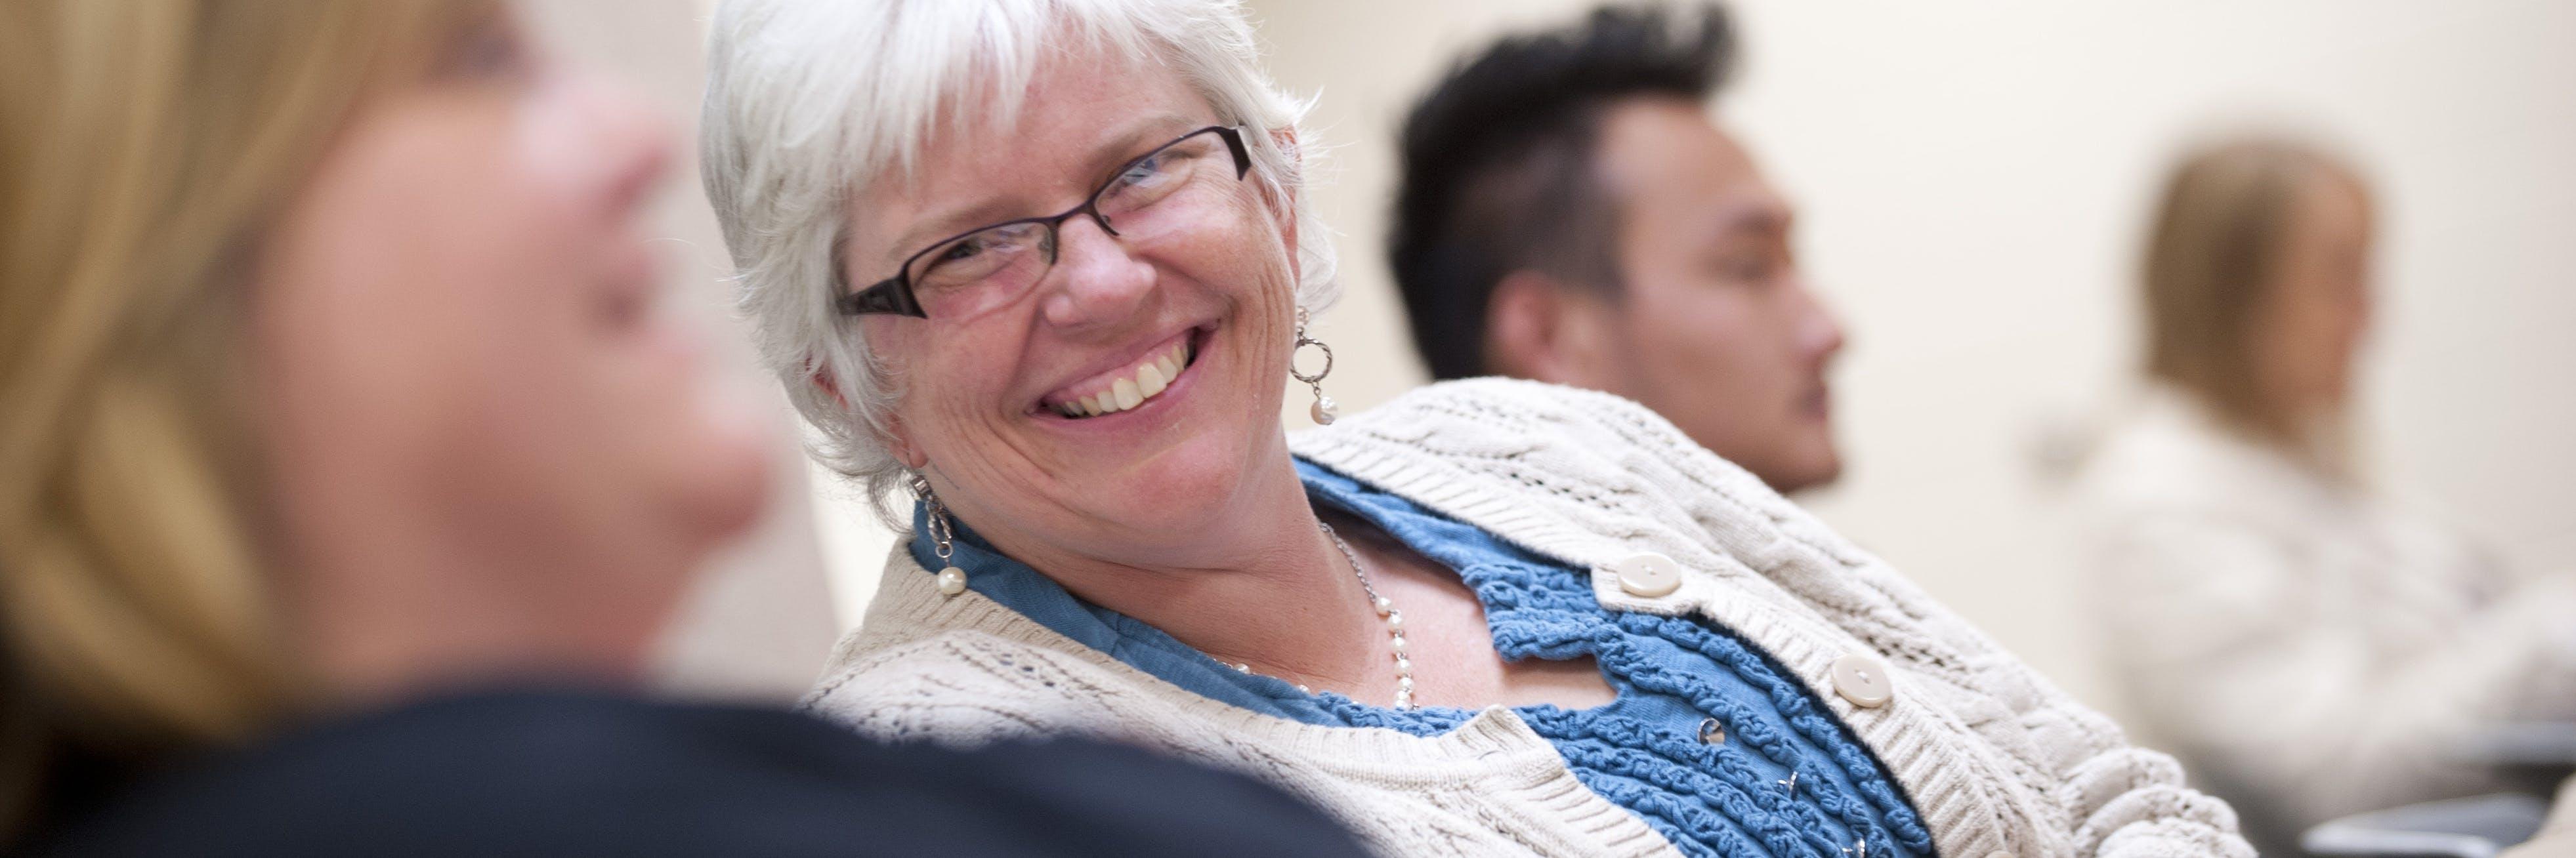 Bethel student smiling at the camera